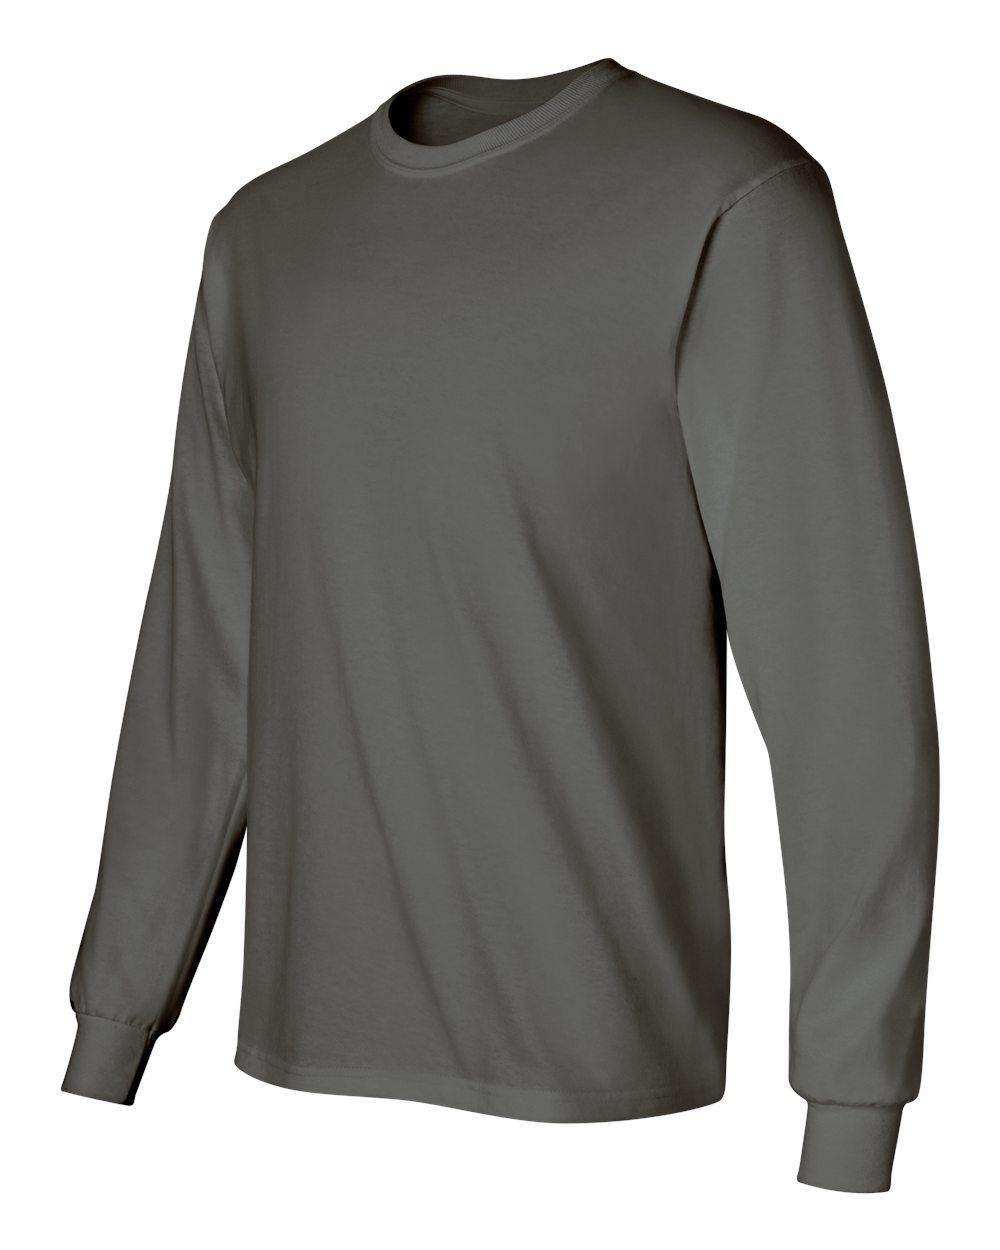 a97b600a952e32 Gildan 2400 - Ultra Cotton Long Sleeve T-Shirt - Friendly Arctic ...